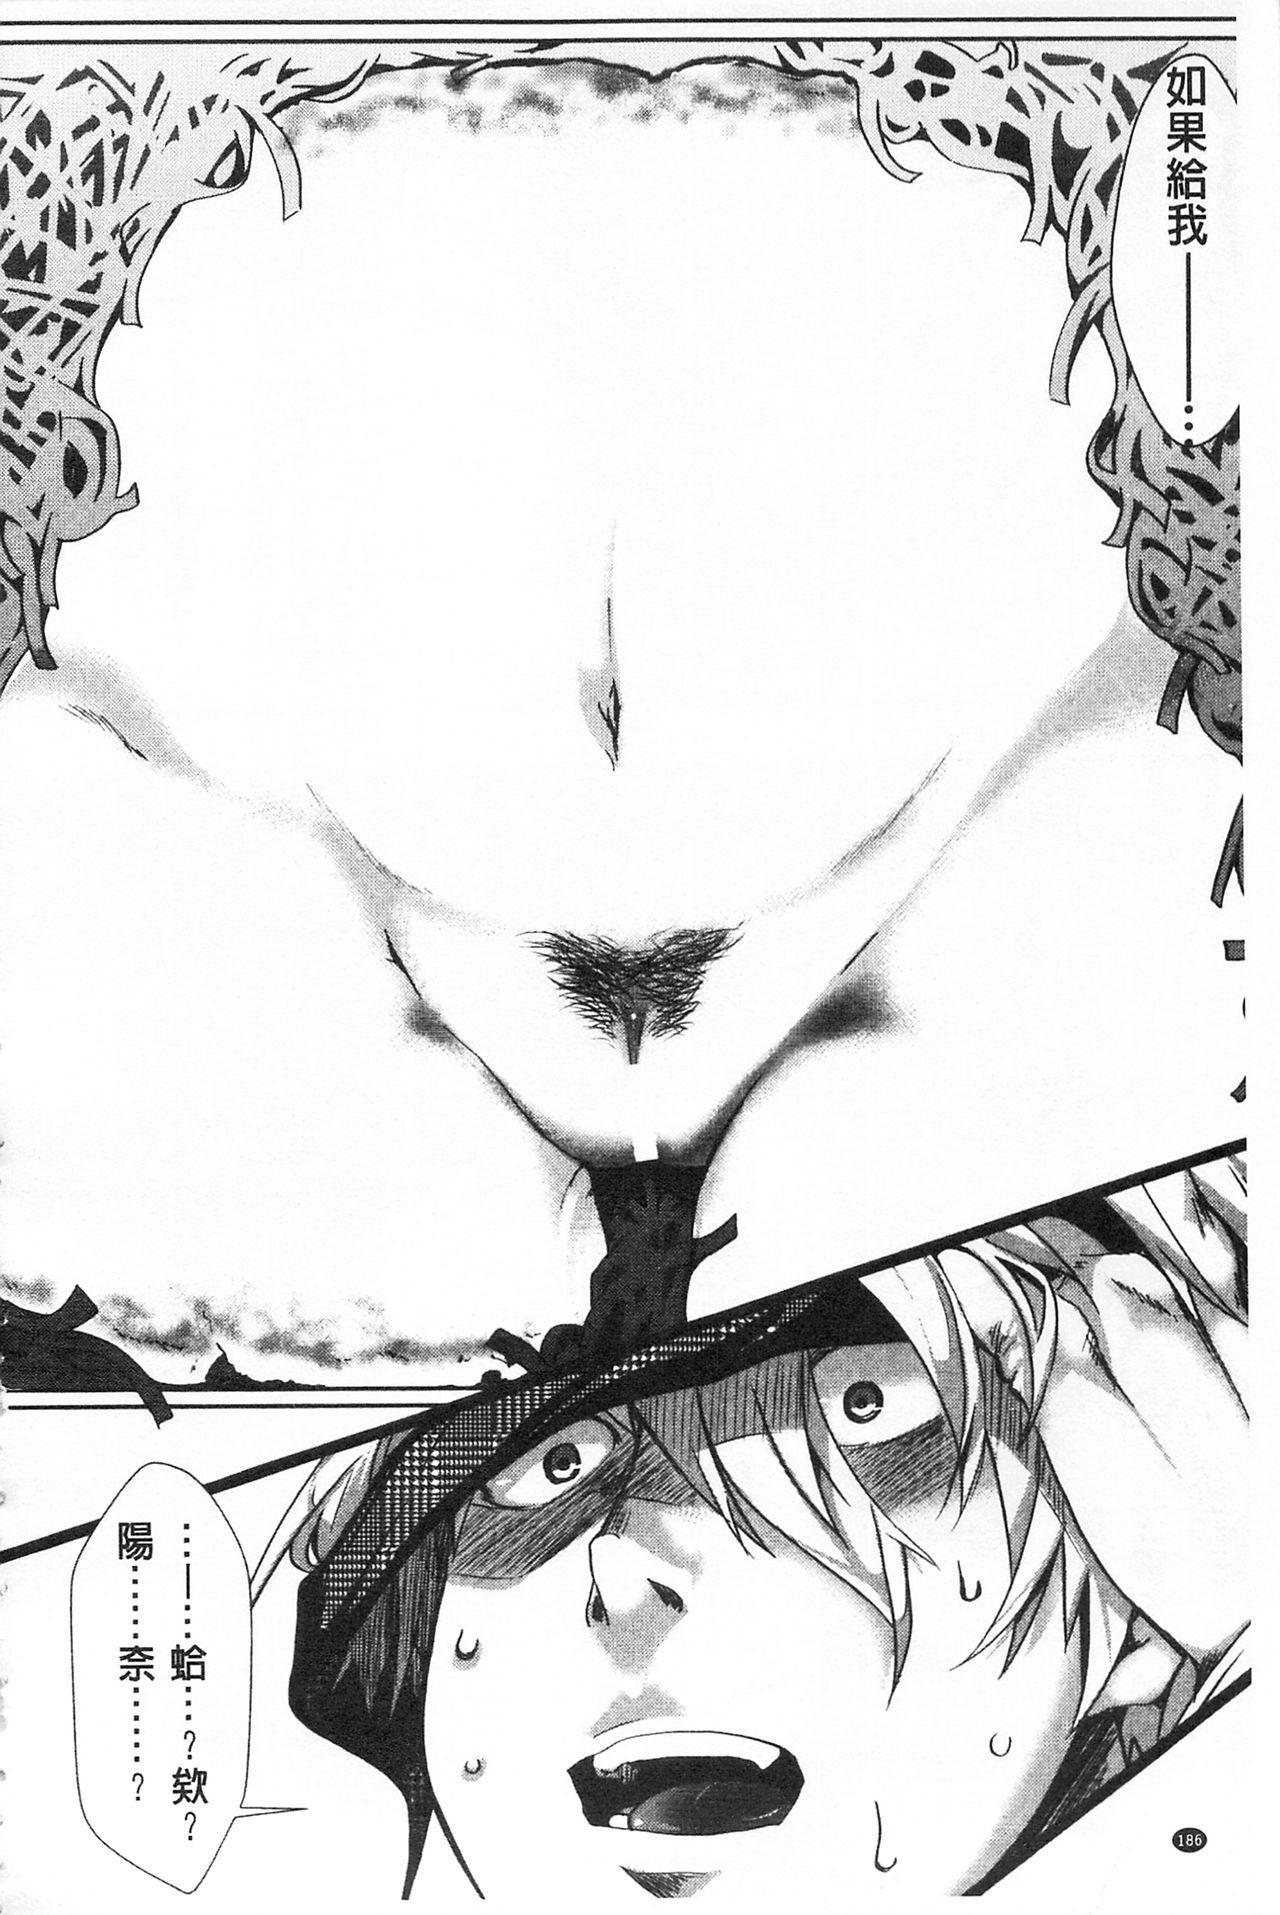 [hal] Daienjou -Ikare Ikasare Iki Ikare-   ∞艶嬢 -洩出來被搞到洩掛了被搞掛-  [Chinese] 187